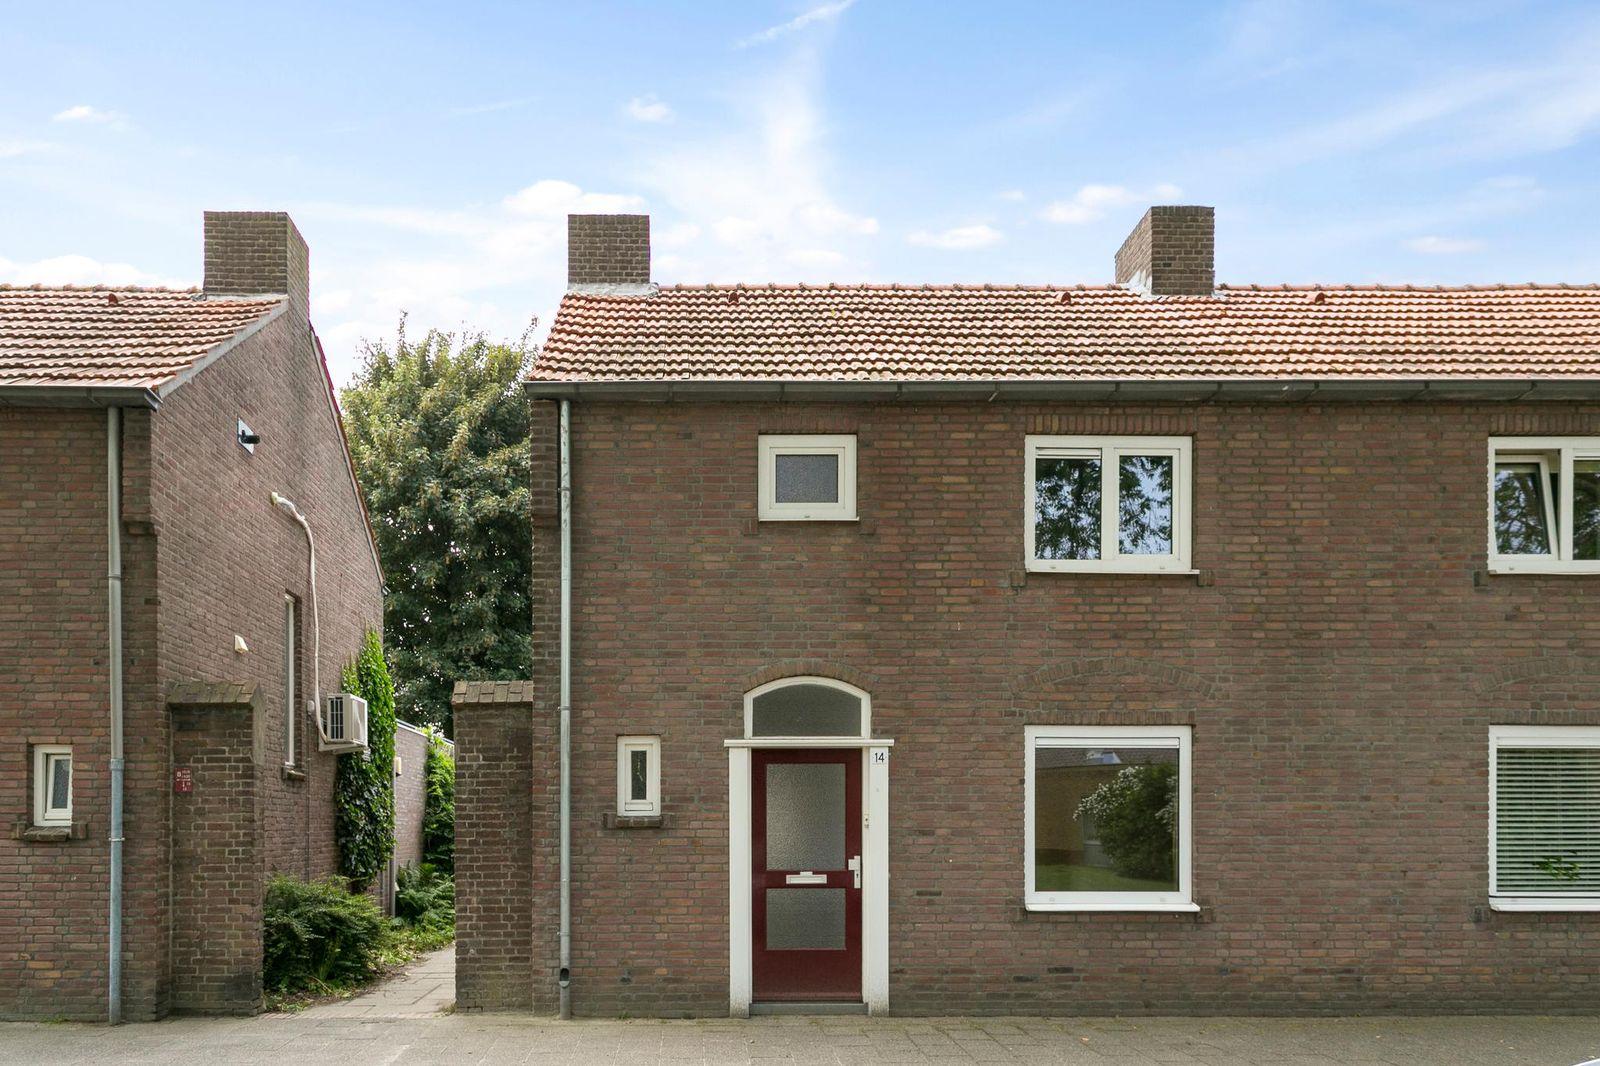 Wethouder Vekemansstraat 14, Goirle